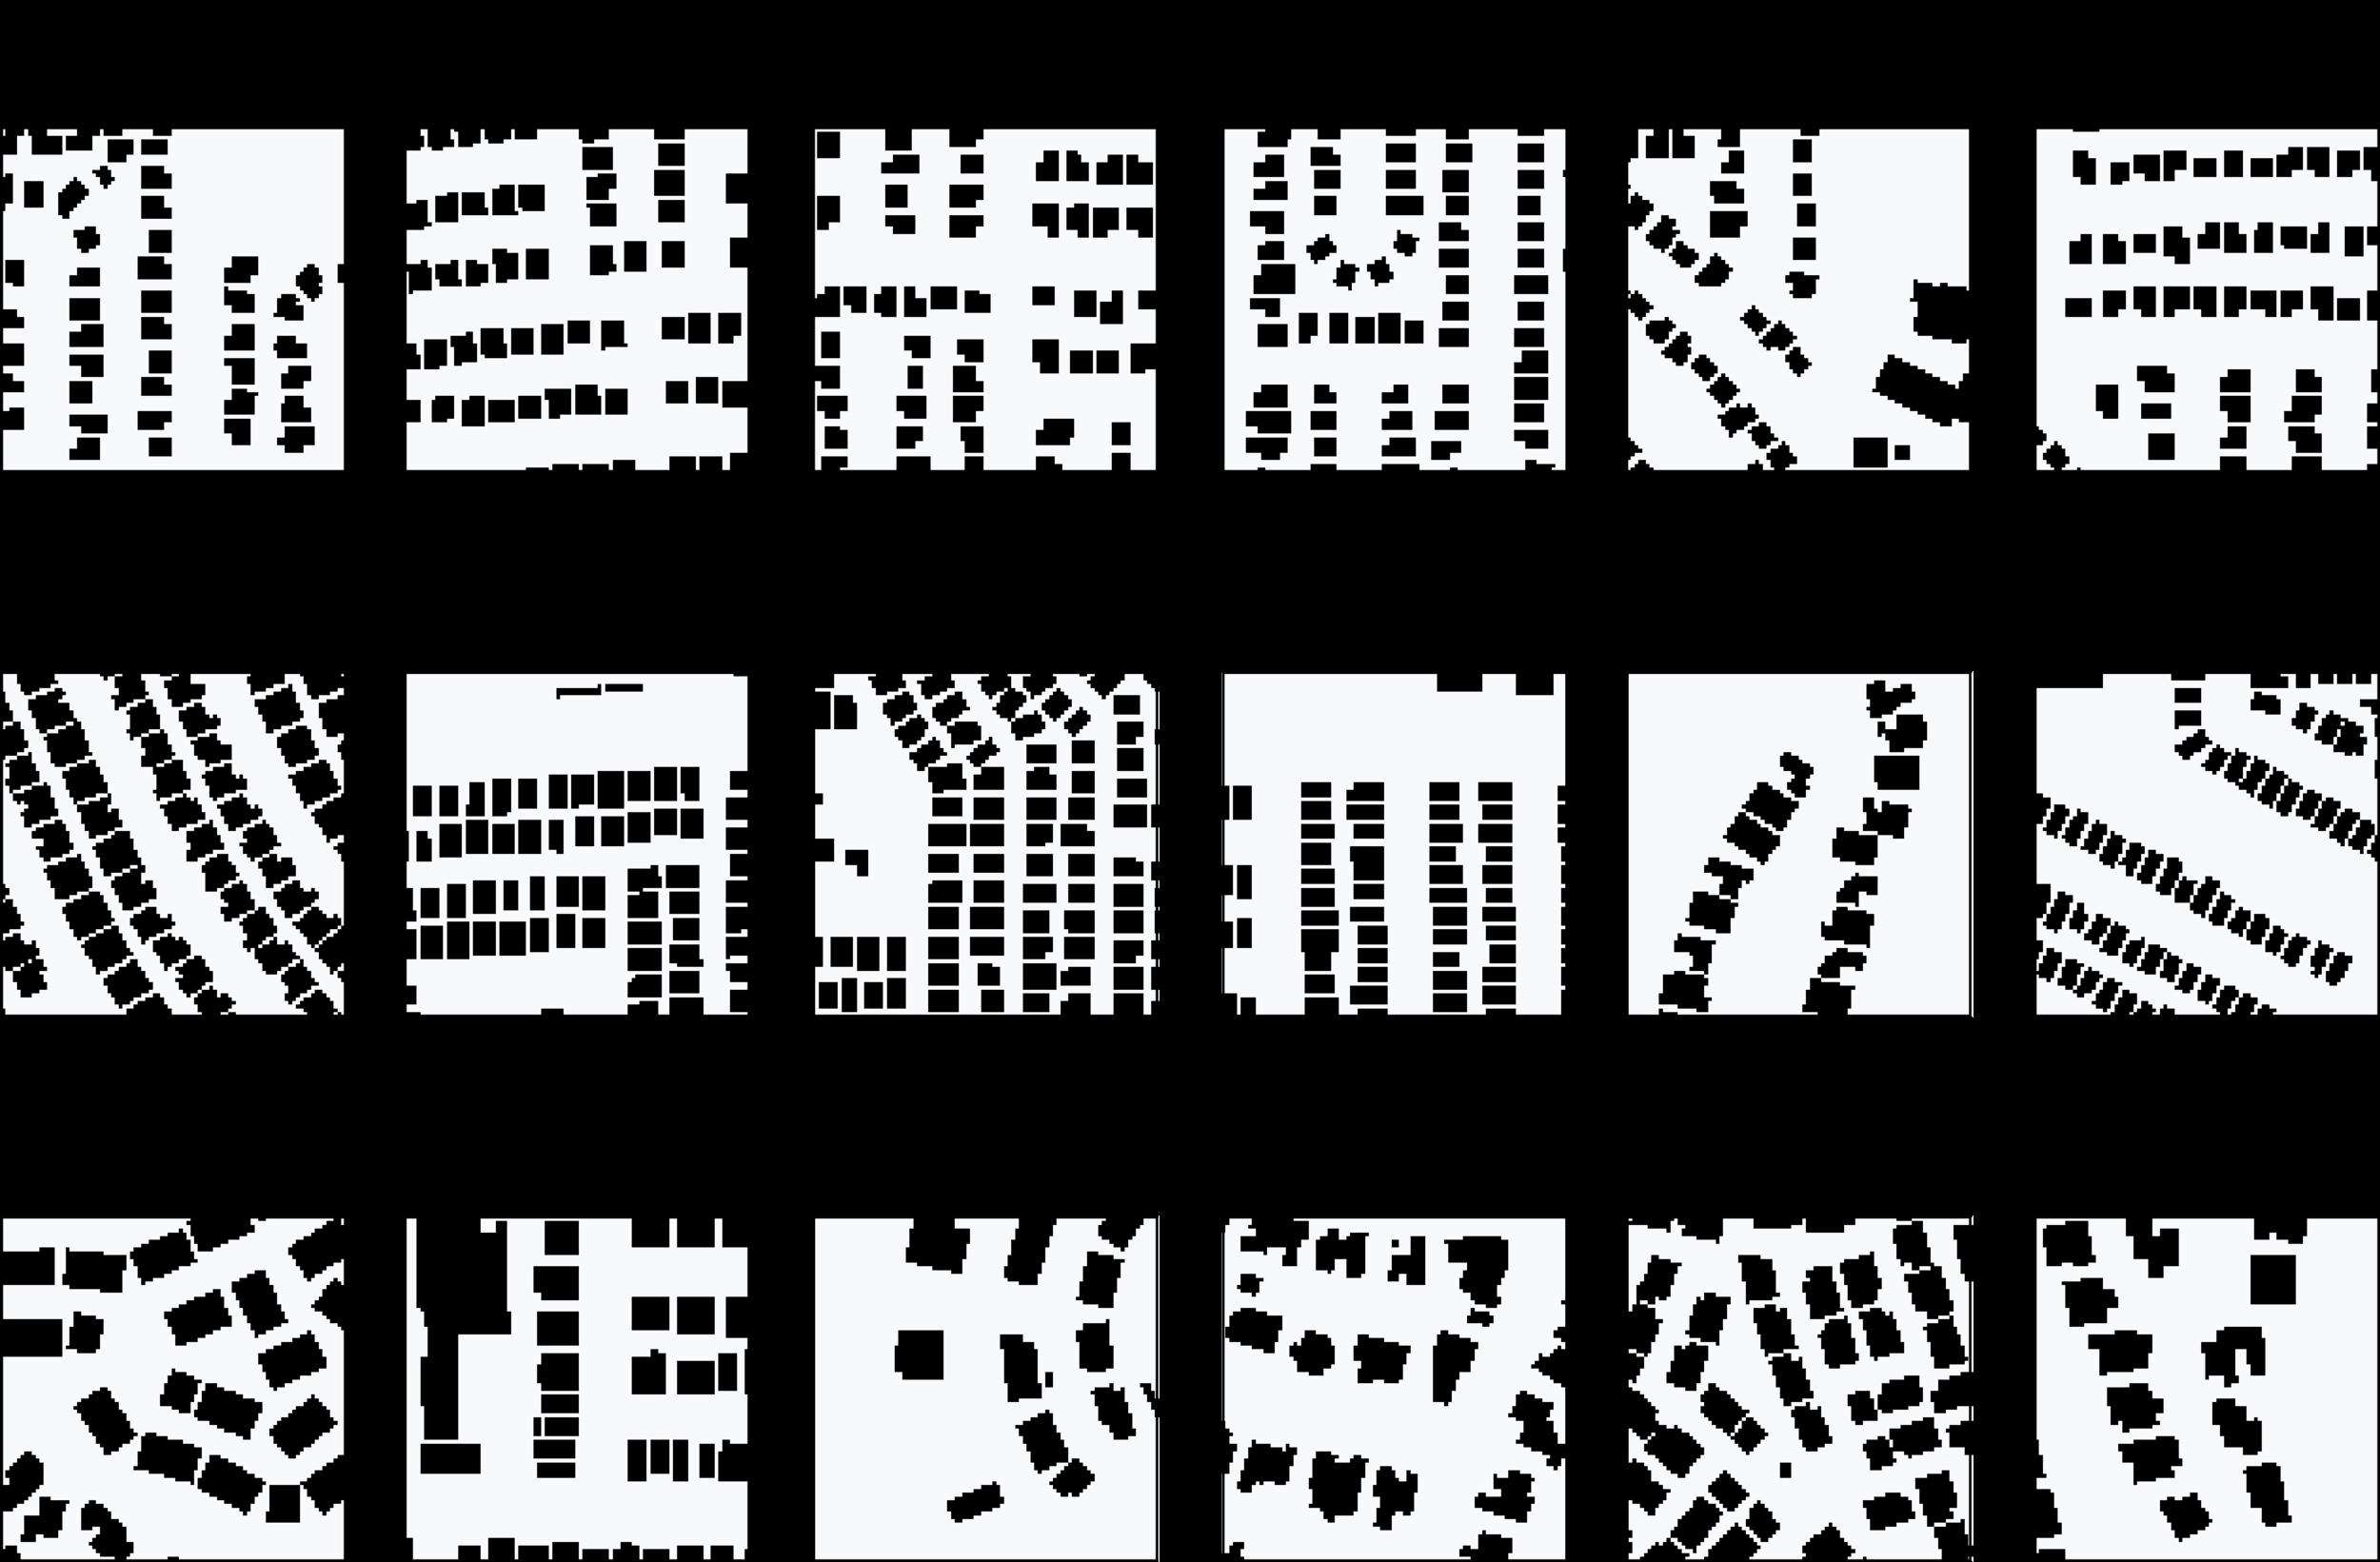 Residential_Low_Density.png